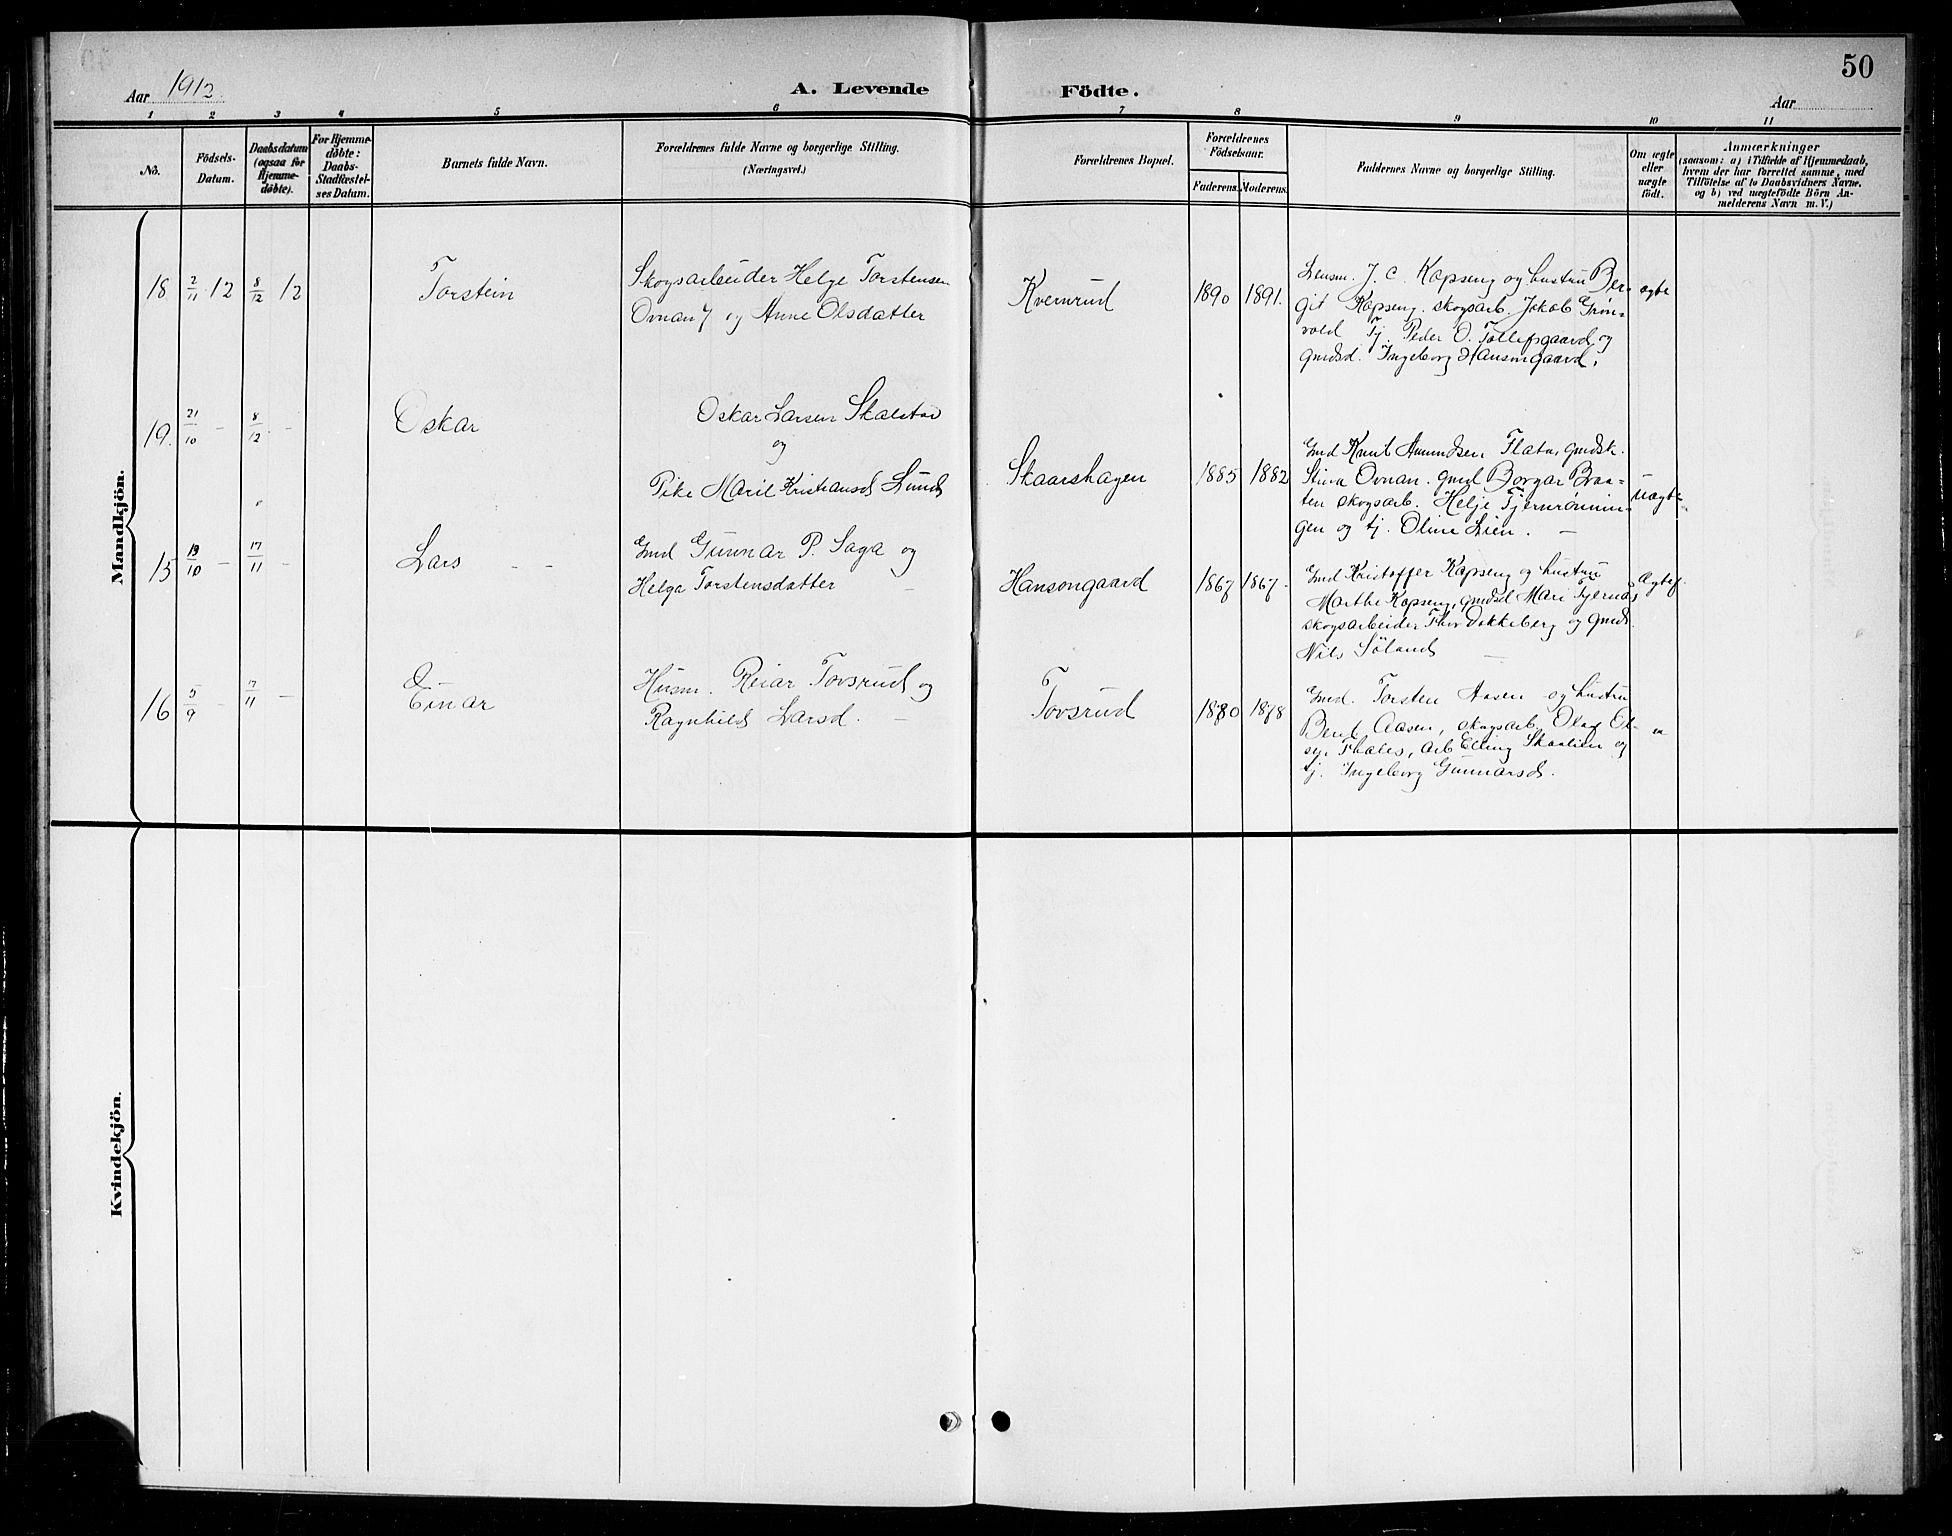 SAKO, Sigdal kirkebøker, G/Gb/L0003: Klokkerbok nr. II 3, 1901-1916, s. 50